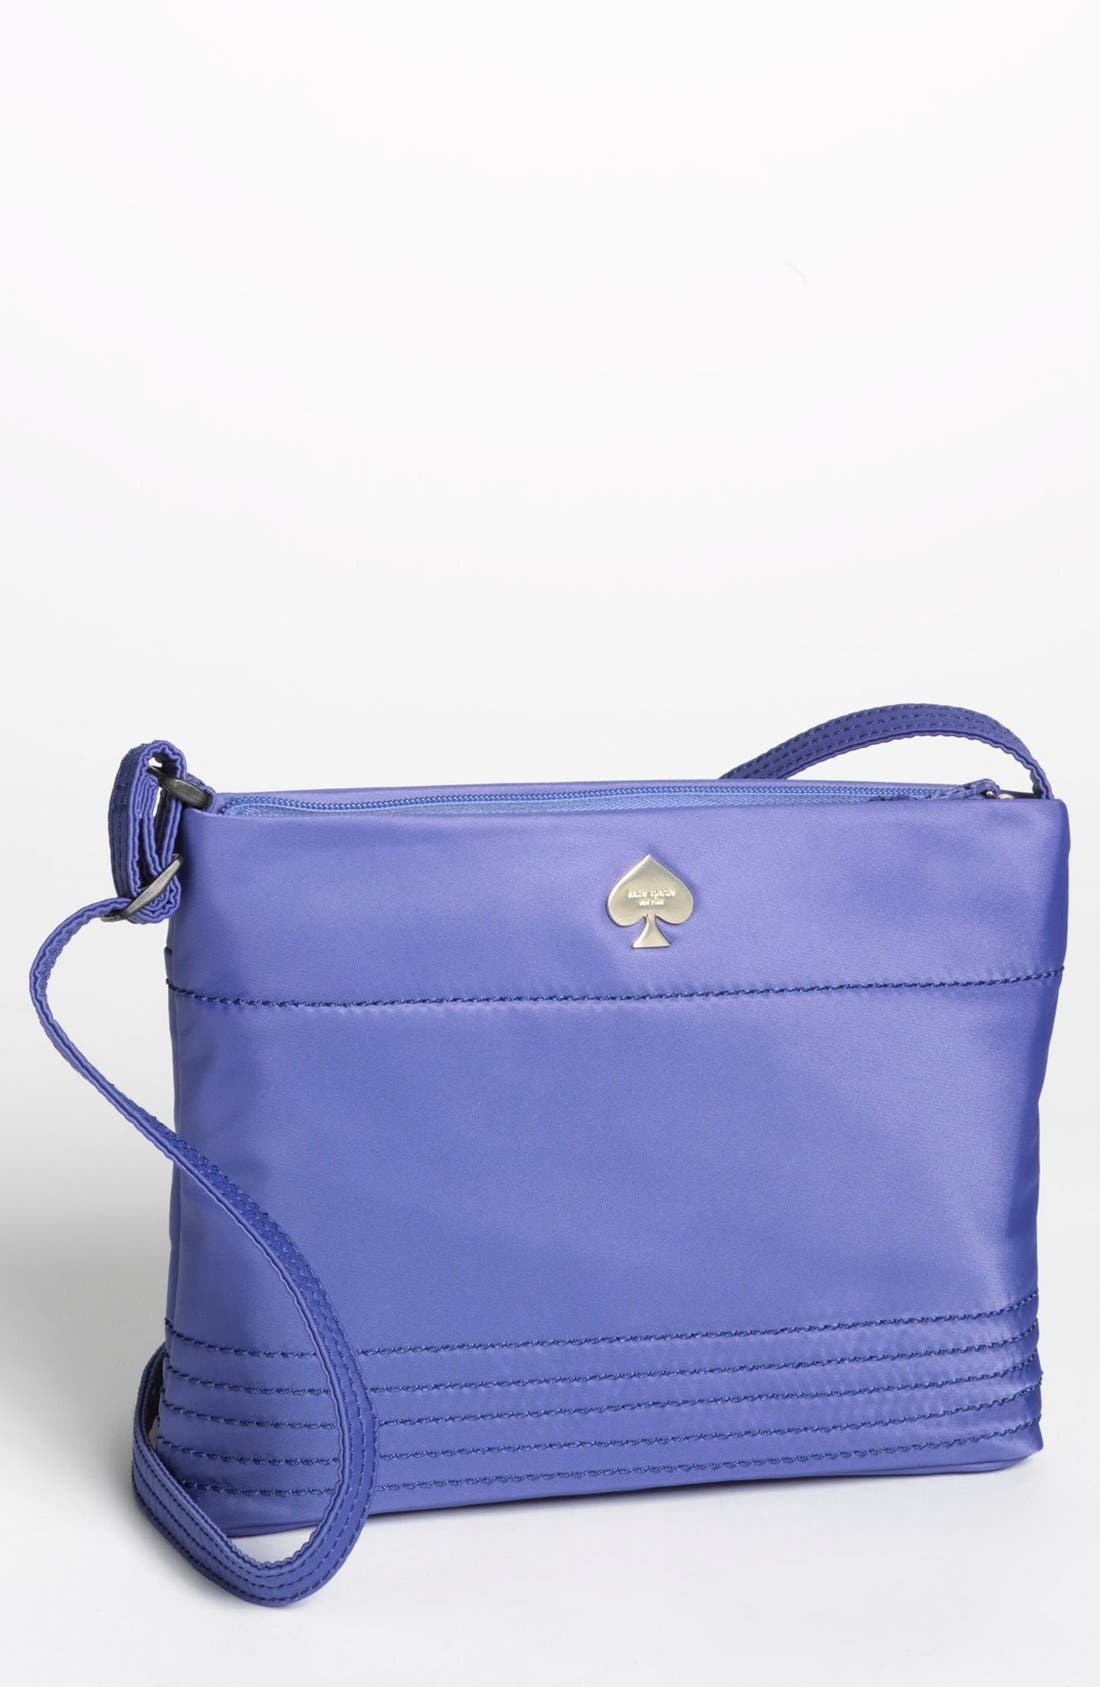 Main Image - kate spade new york 'flatiron - cammy' crossbody bag